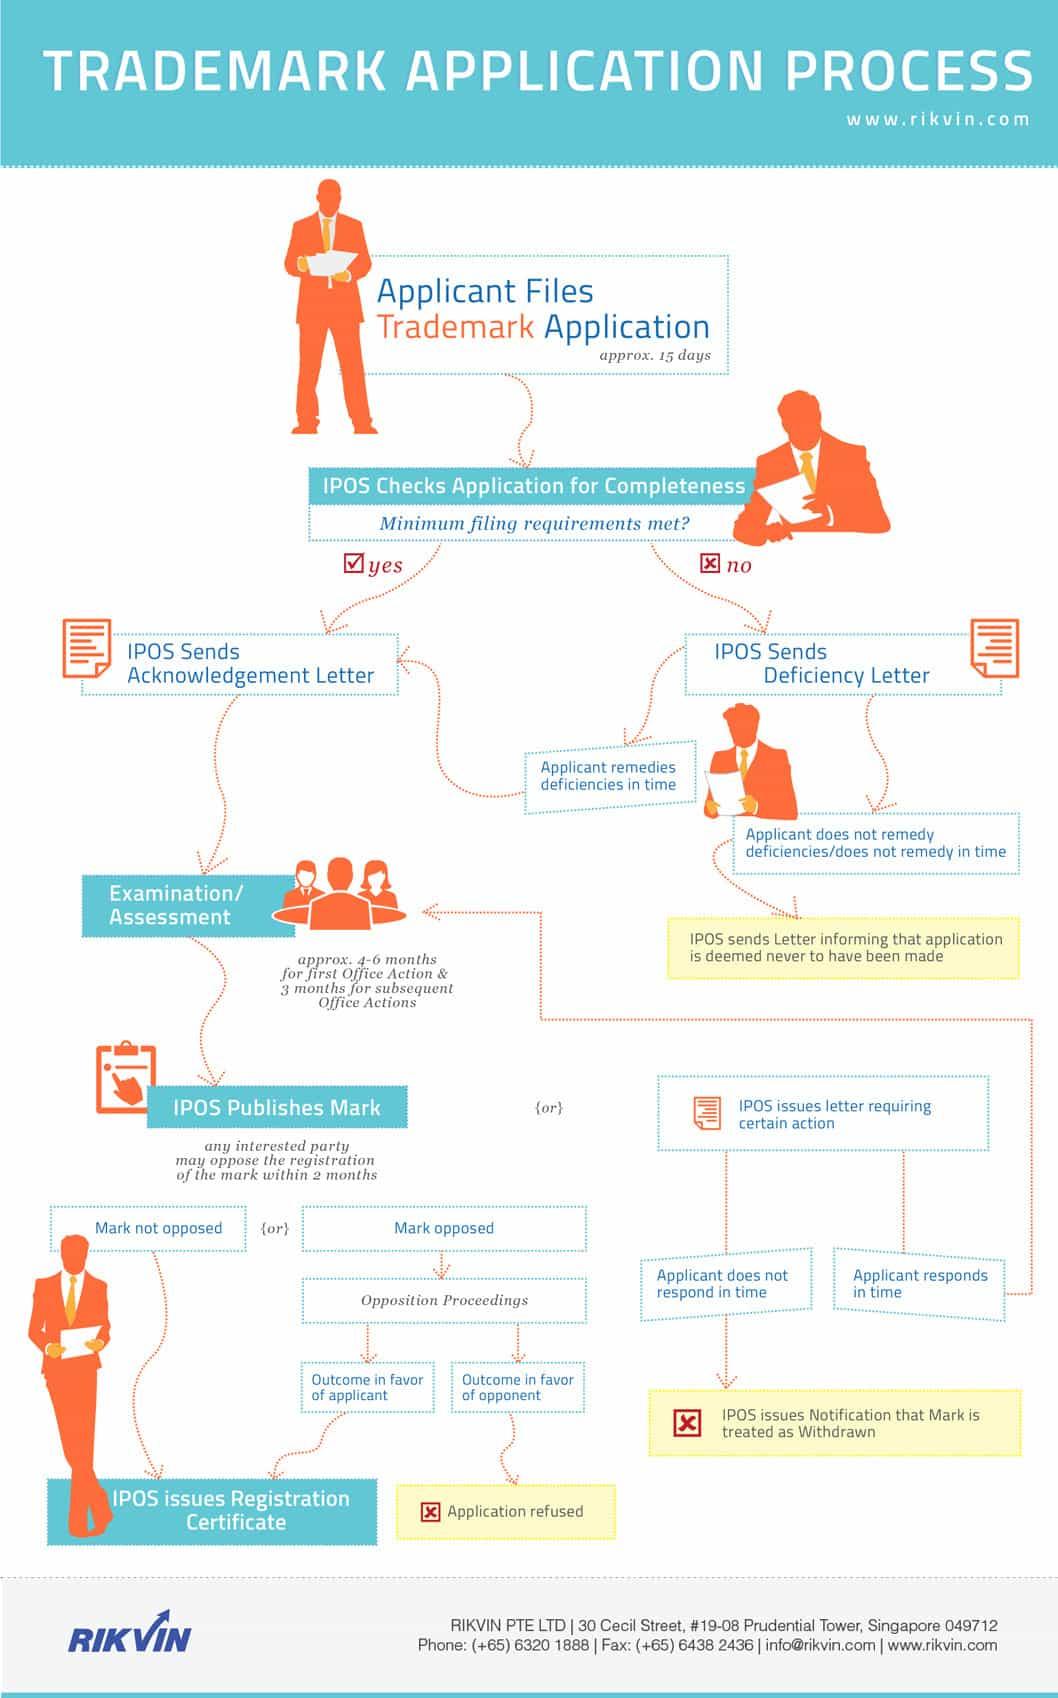 singapore-trademark-application1 Trademark Application Review Process  singapore-trademark-application1 Trademark Application Review Process